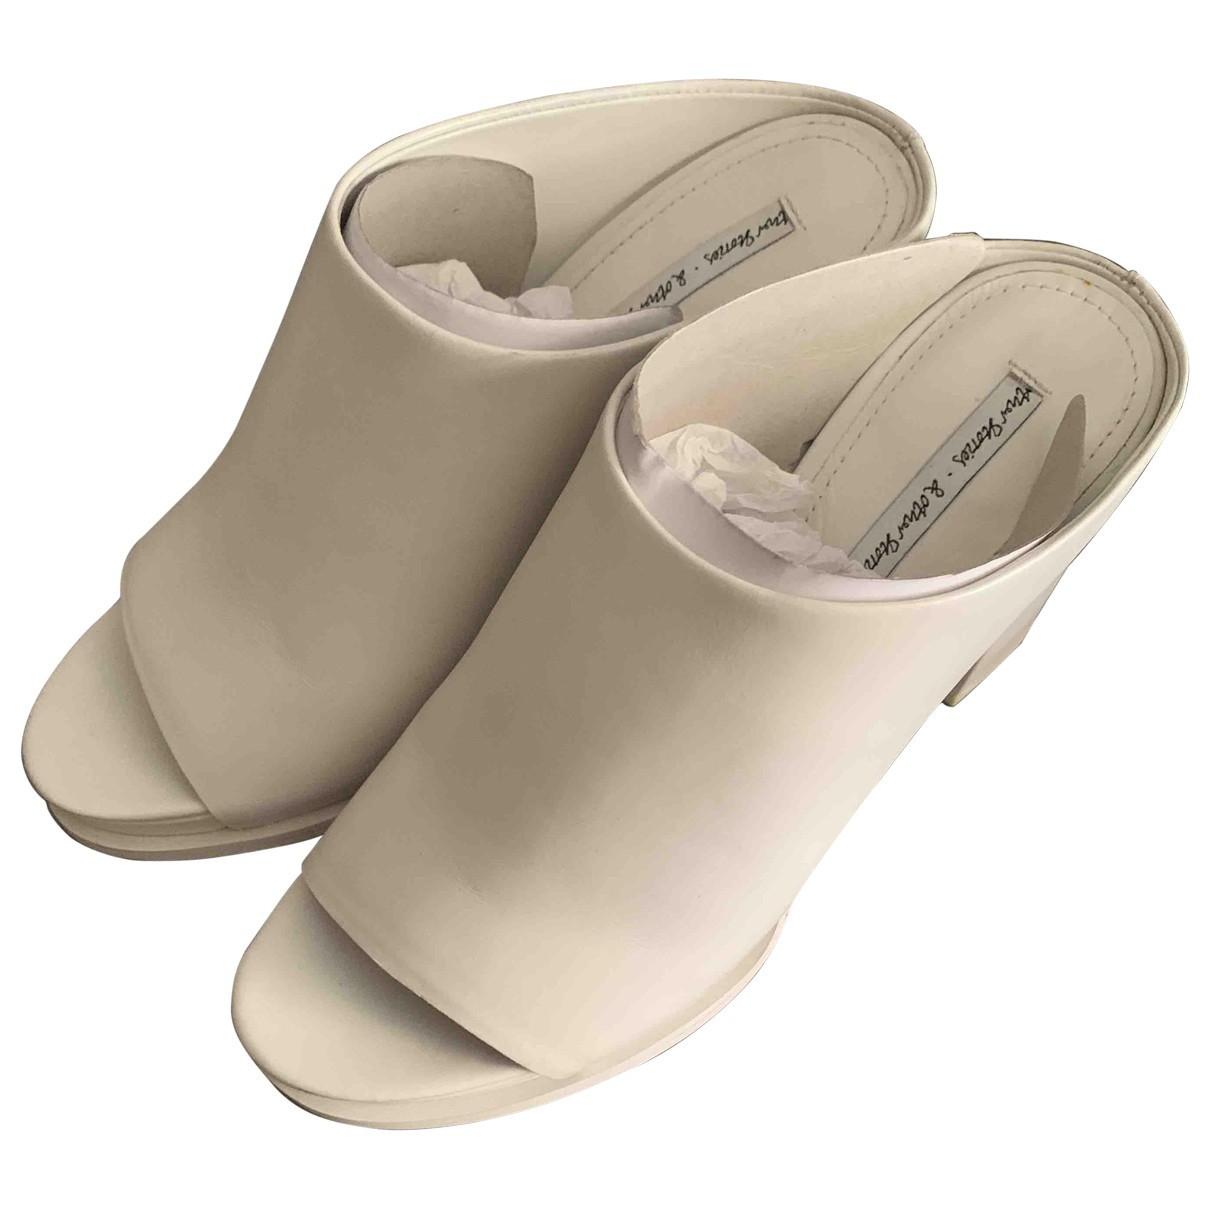 Sandalias romanas de Cuero & Other Stories